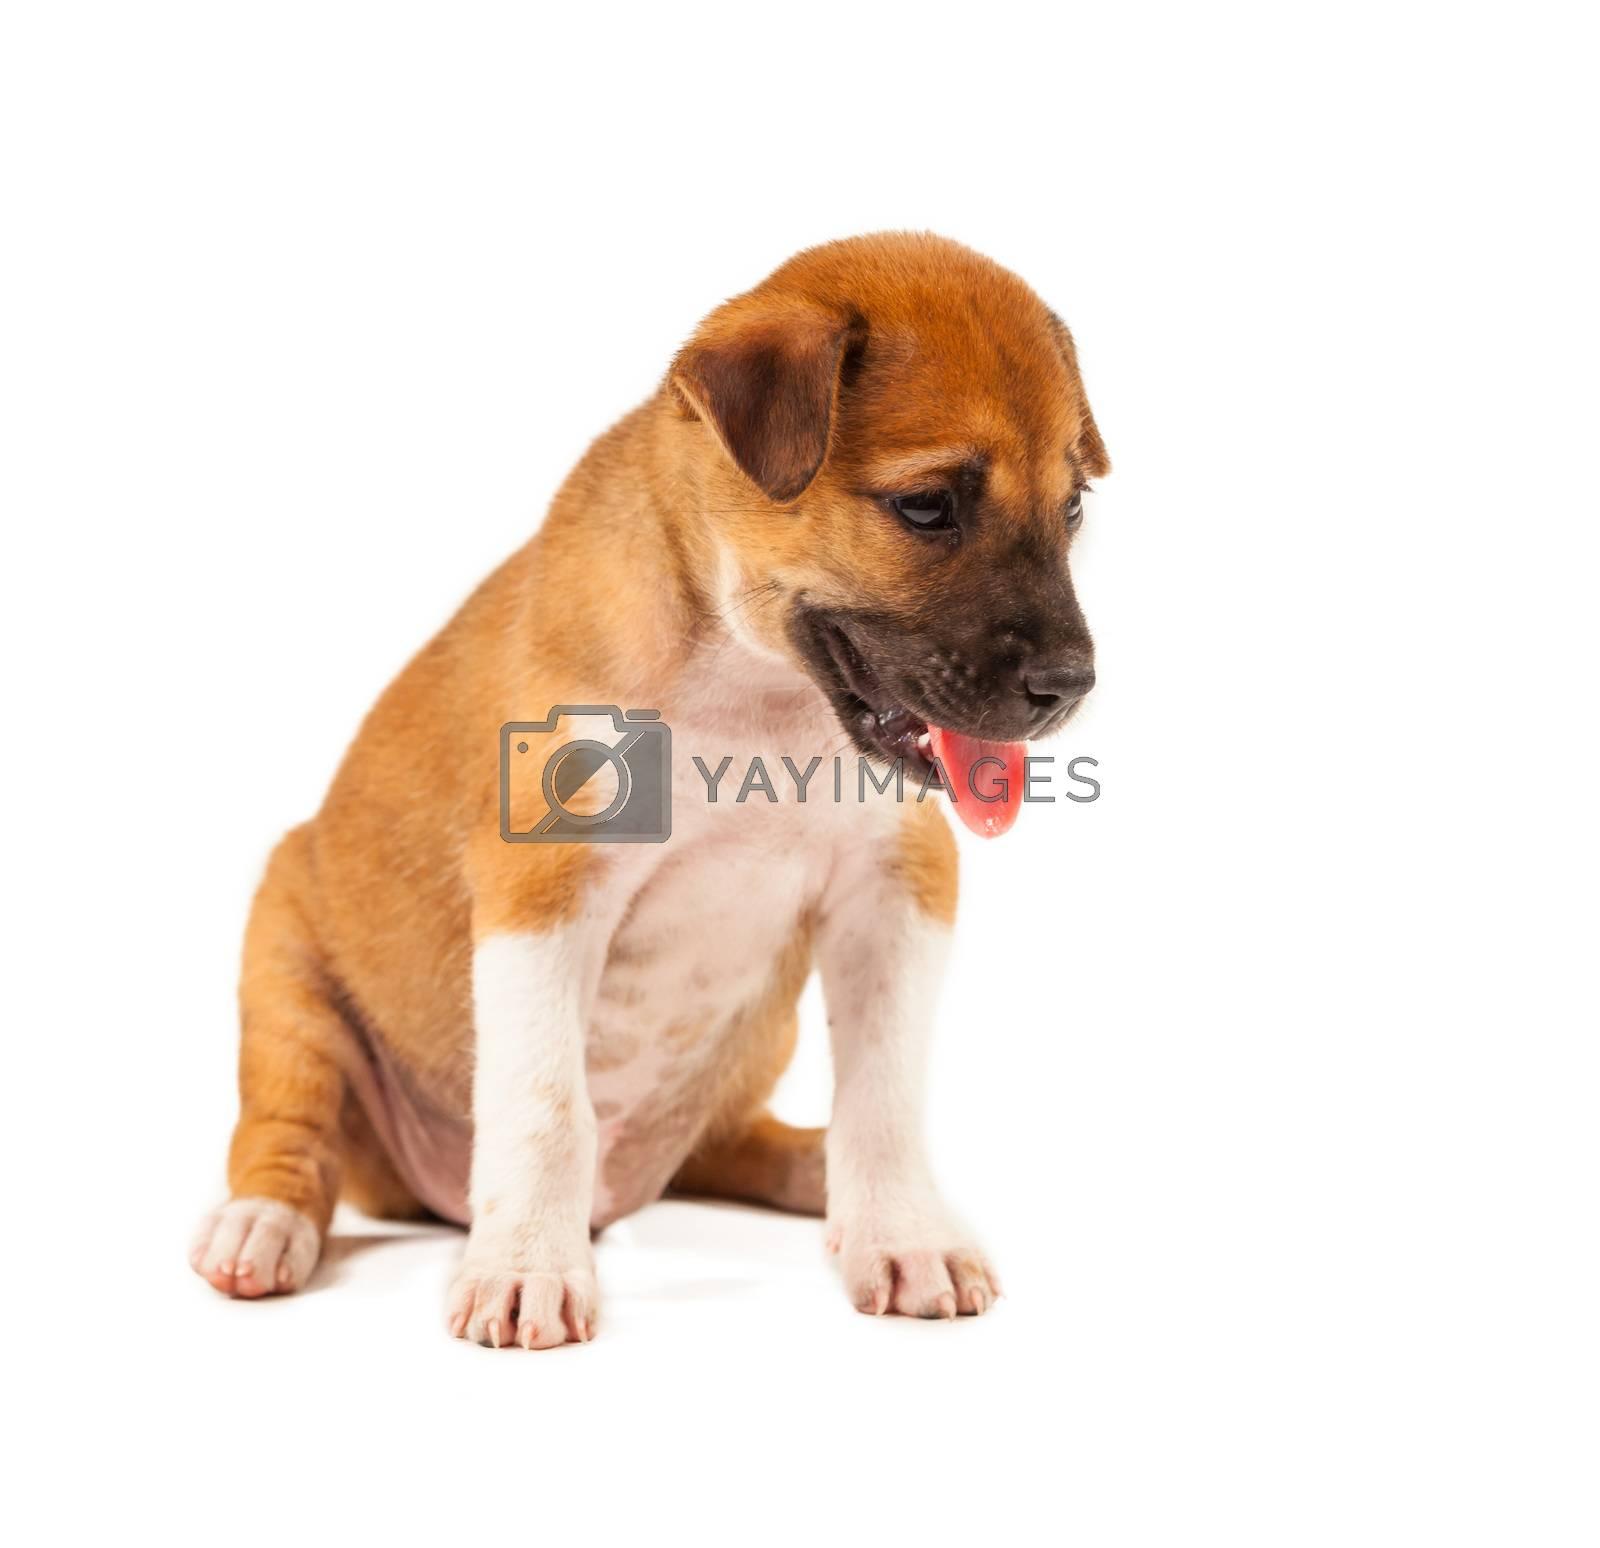 Puppy Dog by witthaya